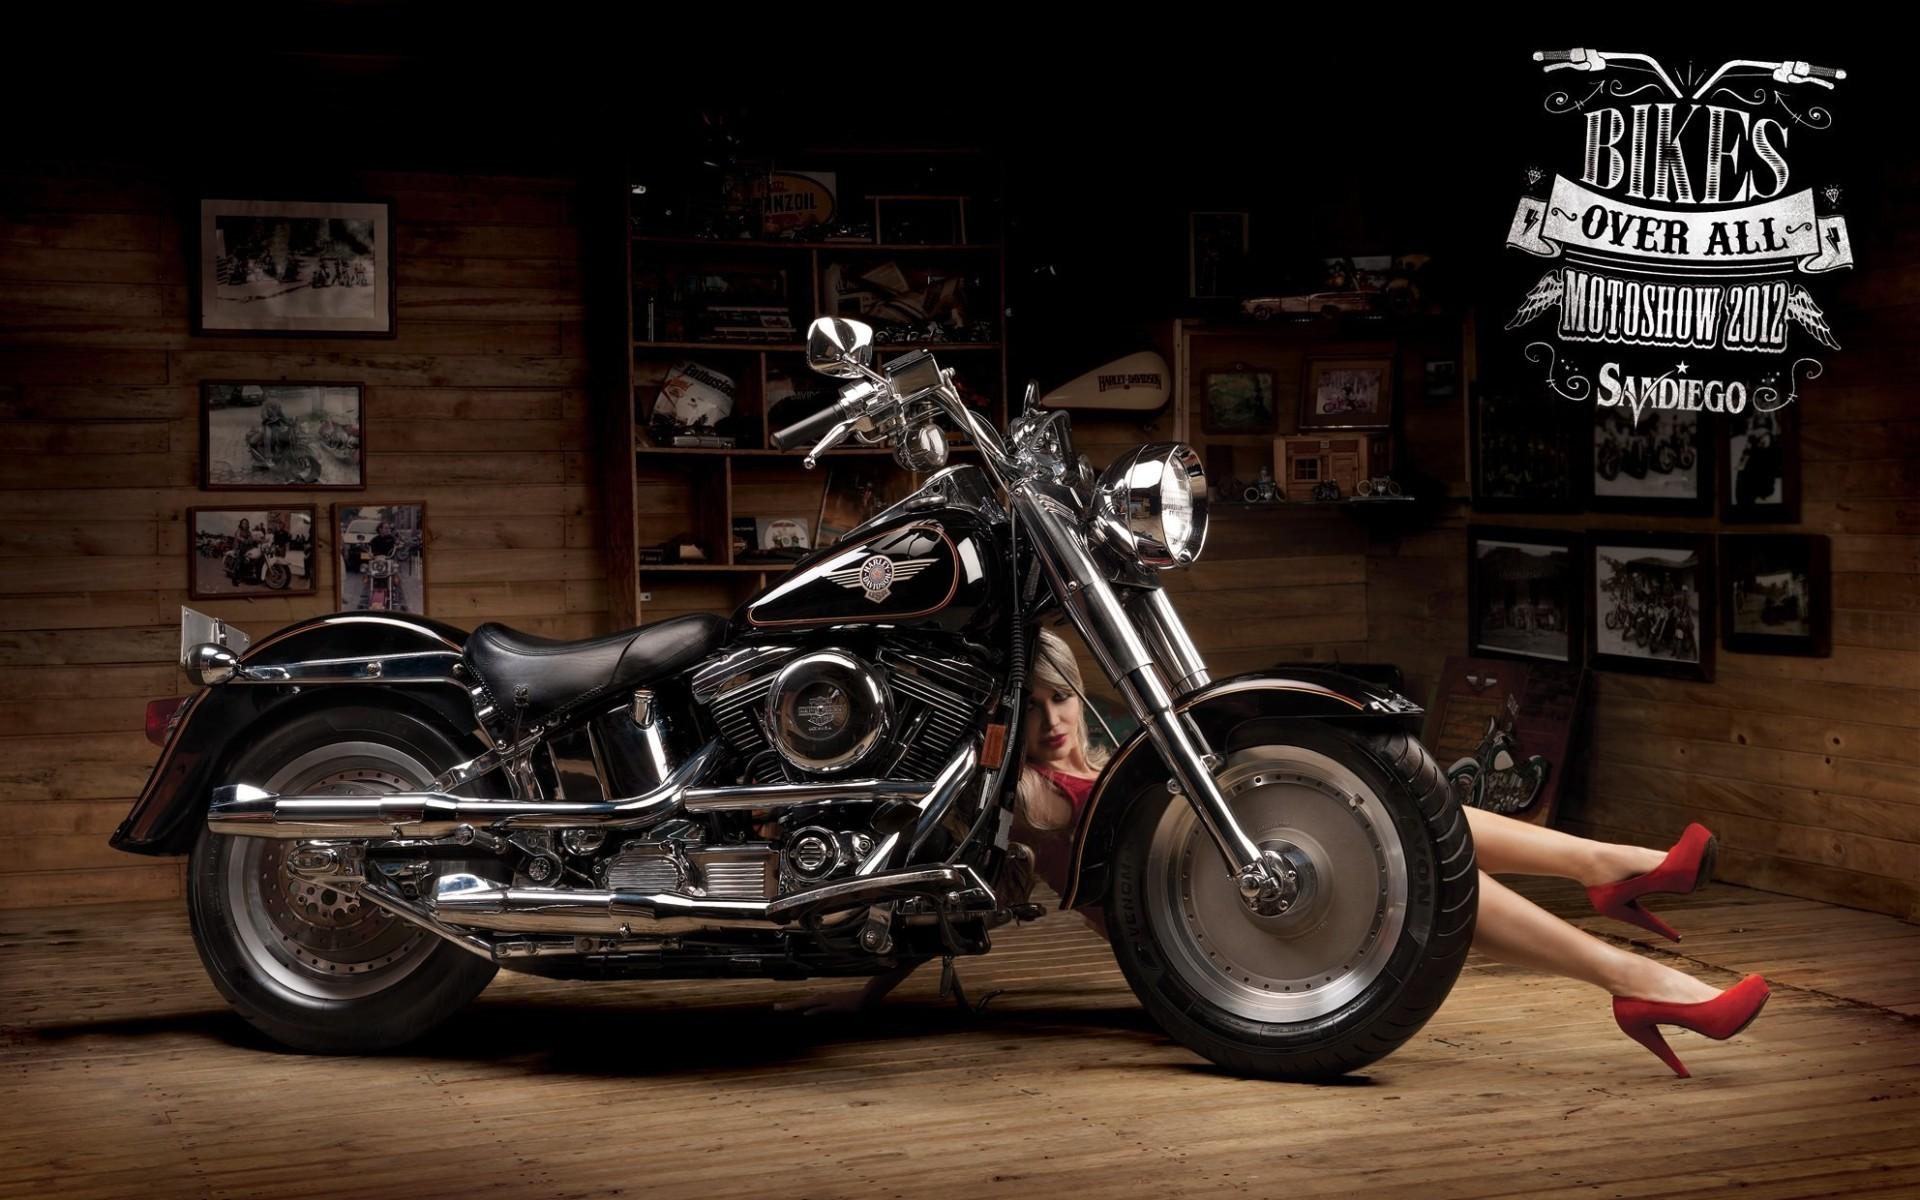 Harley davidson wallpapers and screensavers 80 images 1920x1200 harley davidson wallpaper hd widescreen voltagebd Images